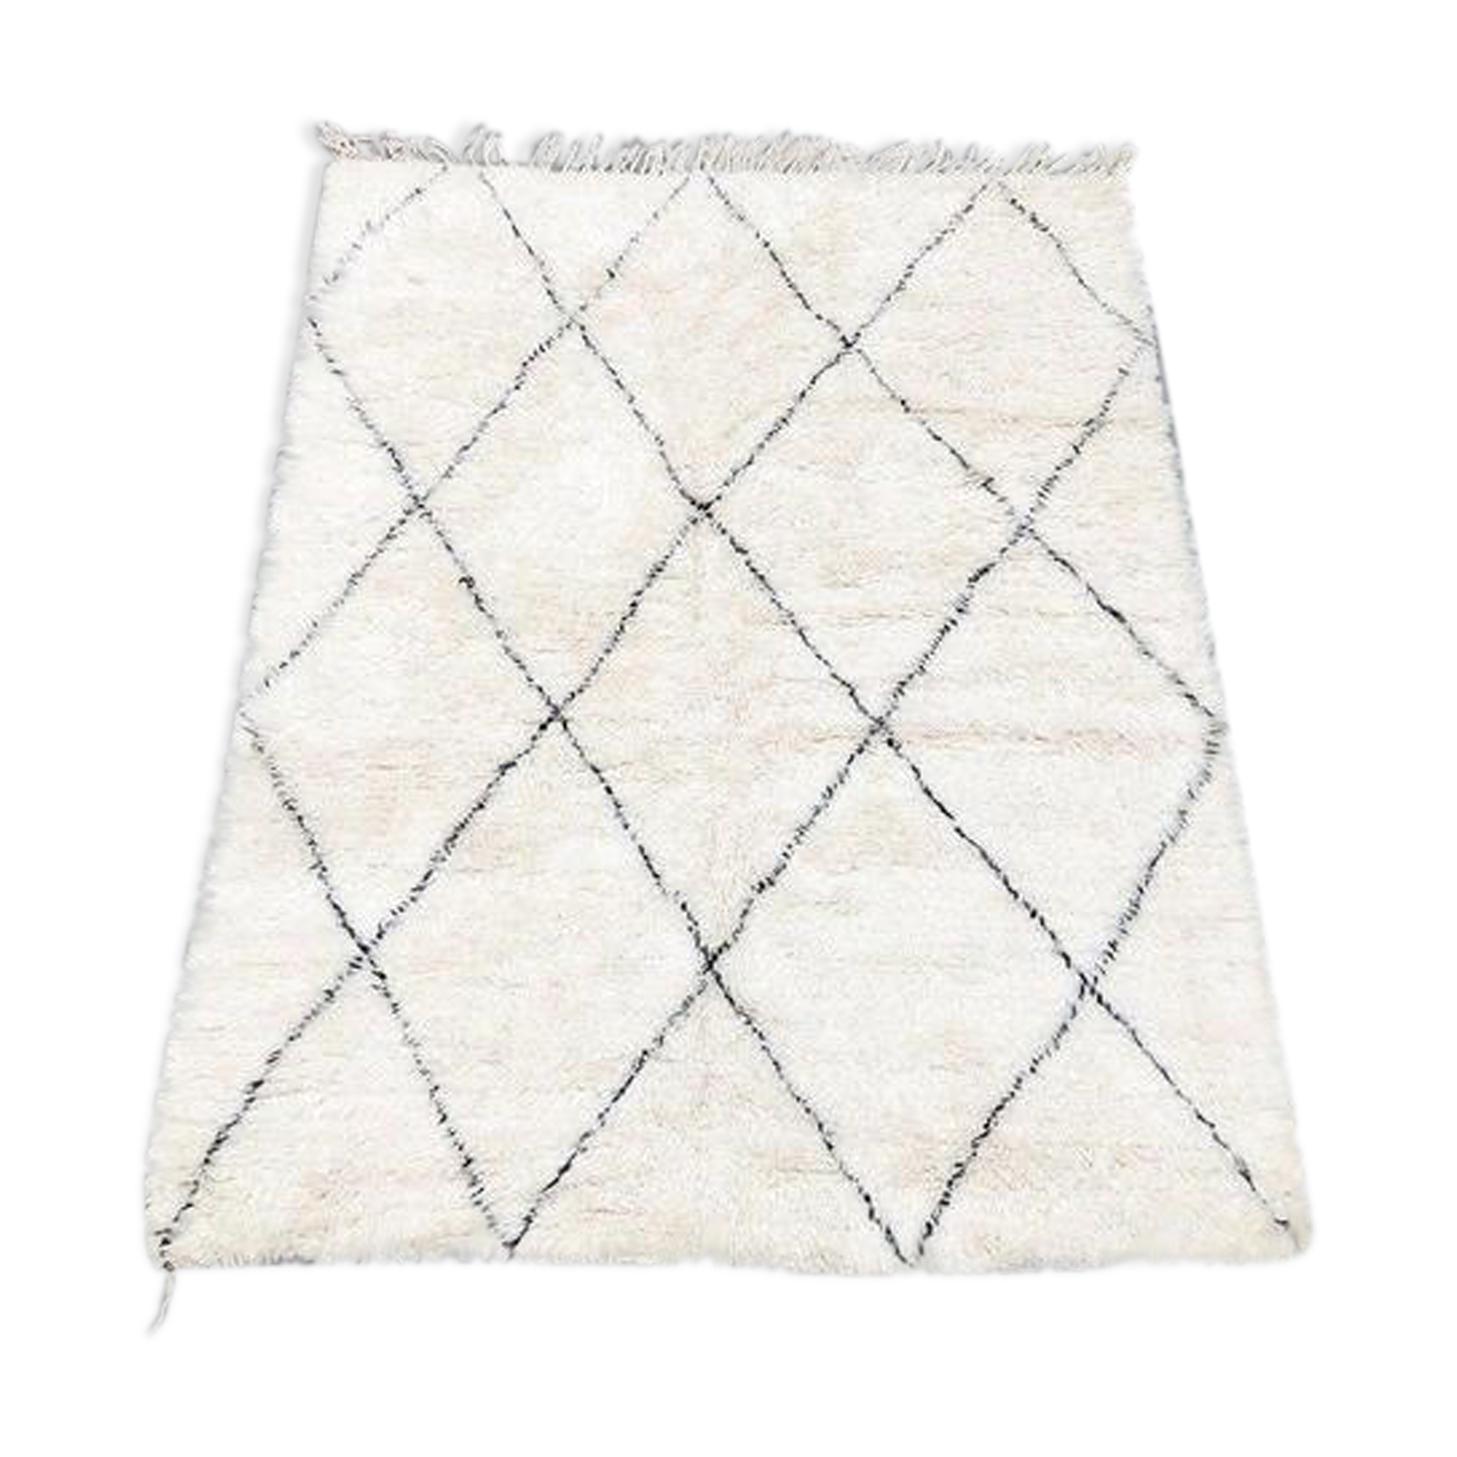 tapis beni ouarain 220x175cm - laine/coton - blanc - éthnique - 13efddo